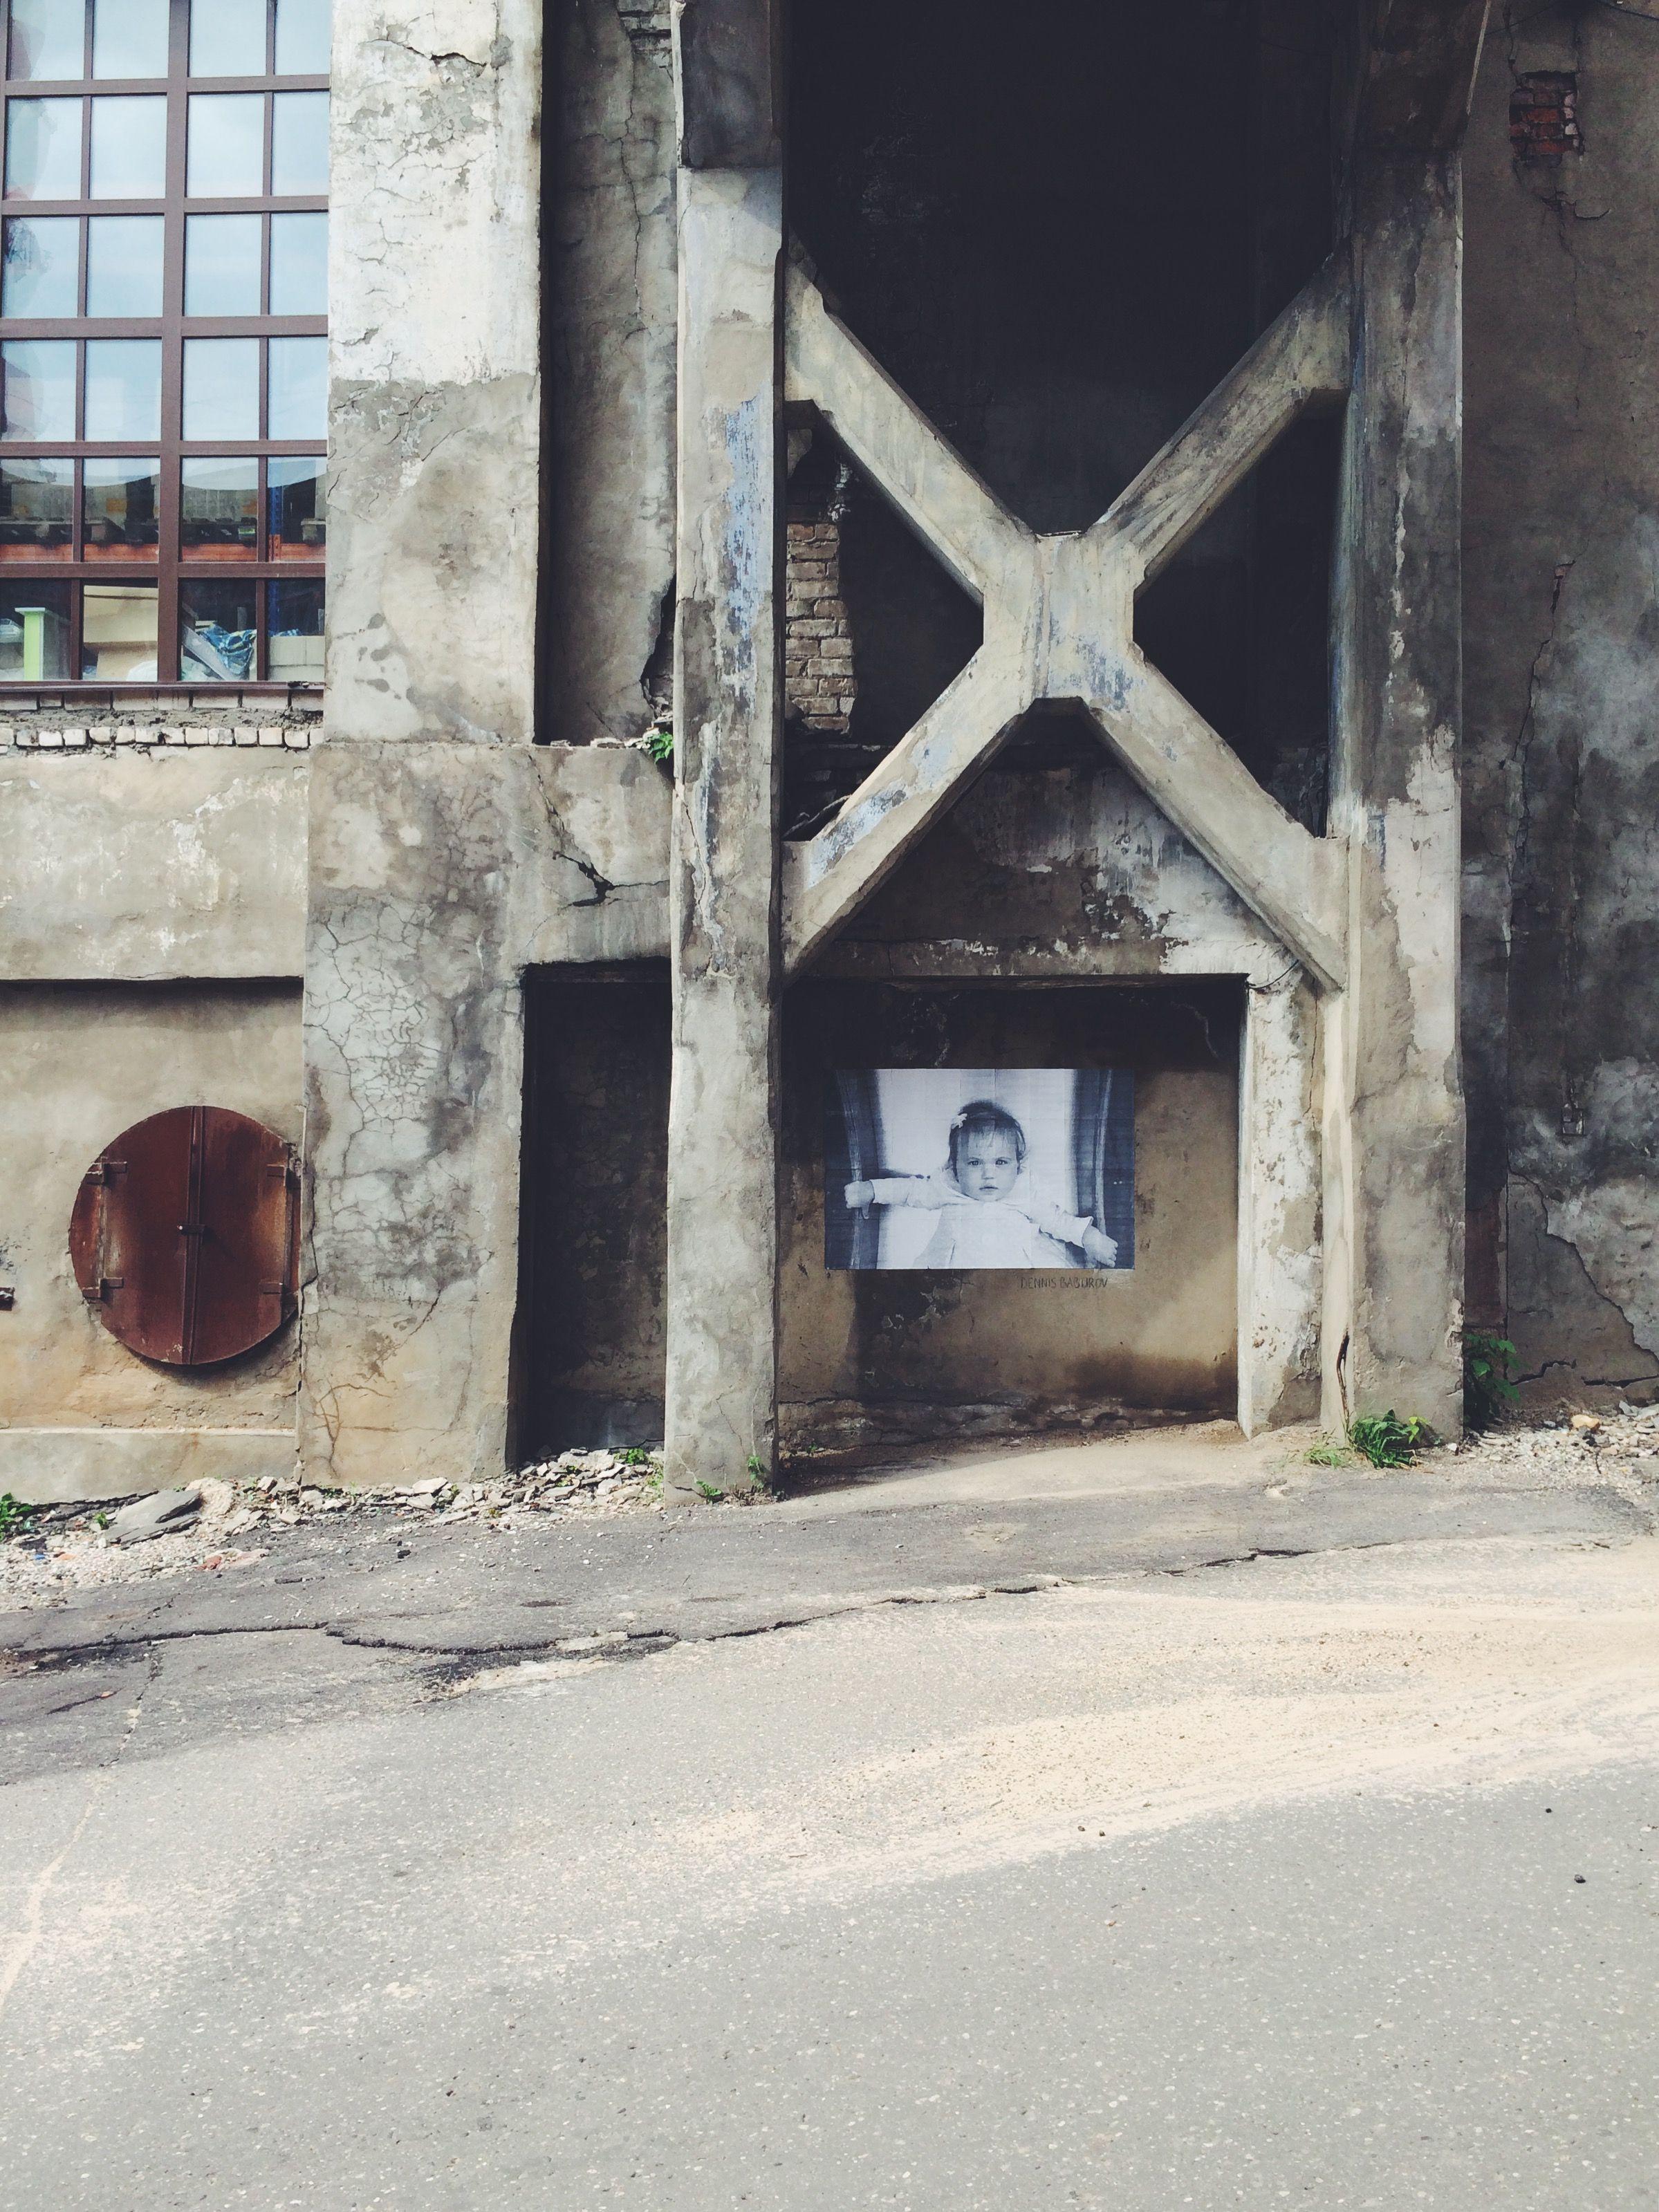 Collaborating with  #nimloft , pushing street art in Ivanovo.